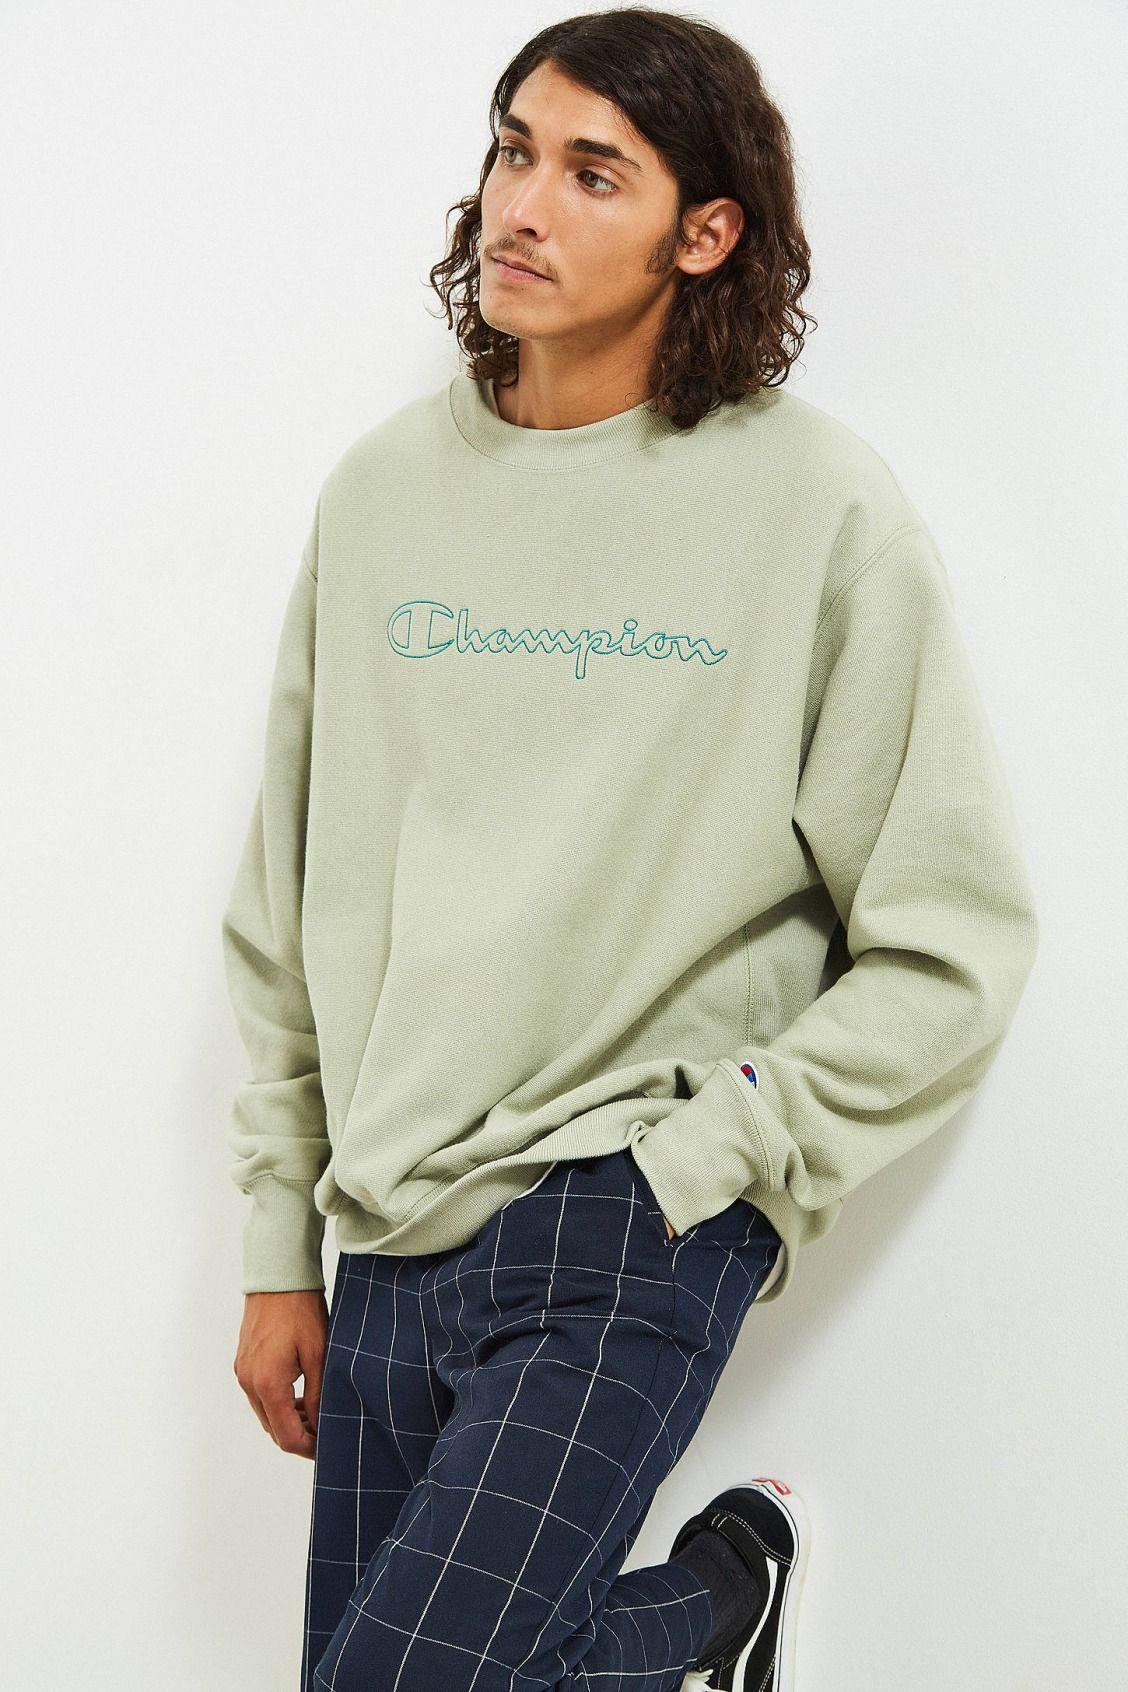 4c176cbeb Champion & Urban Outfitters Script Logo Crew Neck Sweatshirt | Urban  Outfitters